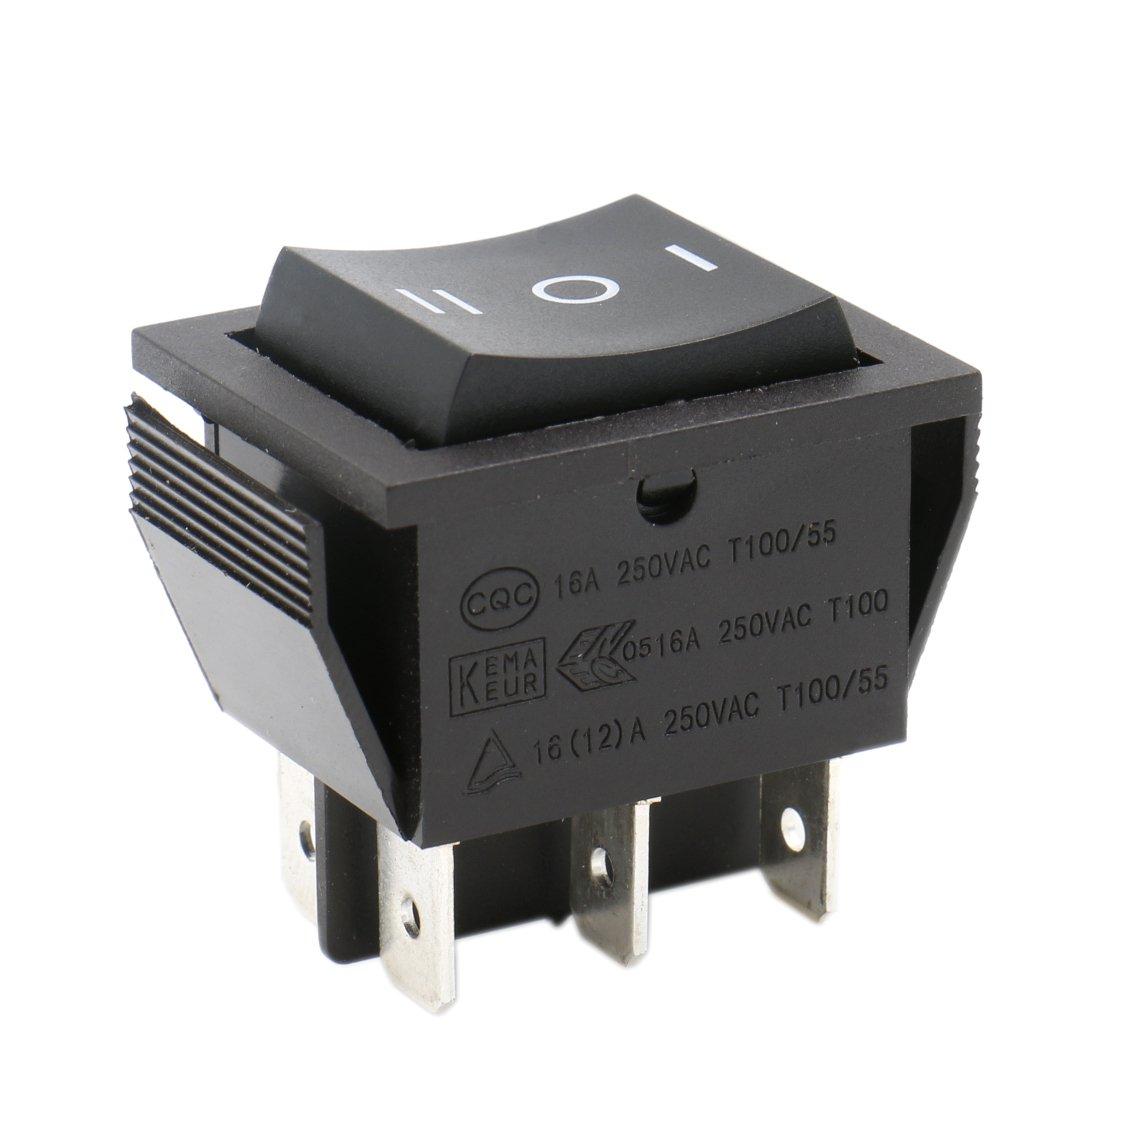 Heschen Interrupteur à bascule On-off-on DPDT 6Bornes 16A 250VAC Noir Lot de 2 Ningbo Master Soken Electrical Co.Ltd RK1-01-HS